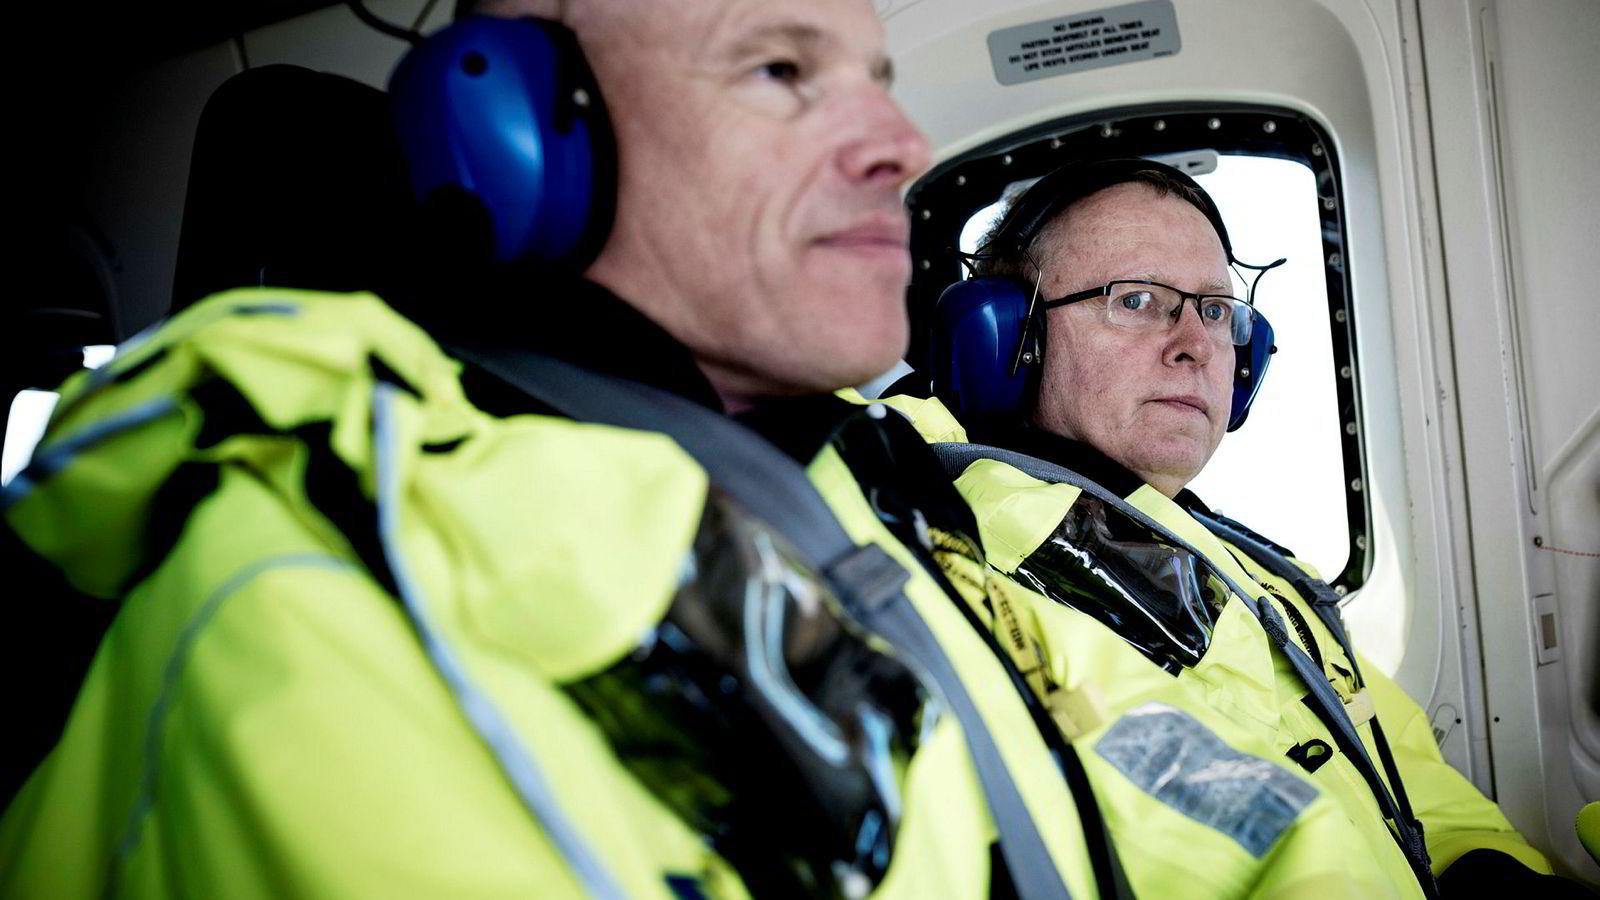 Konsernsjef Eldar Sætre i Equinor og Arne Sigve Nylund, sjef for norsk sokkel, må se at Martin Linge-prosjektet sprekker.